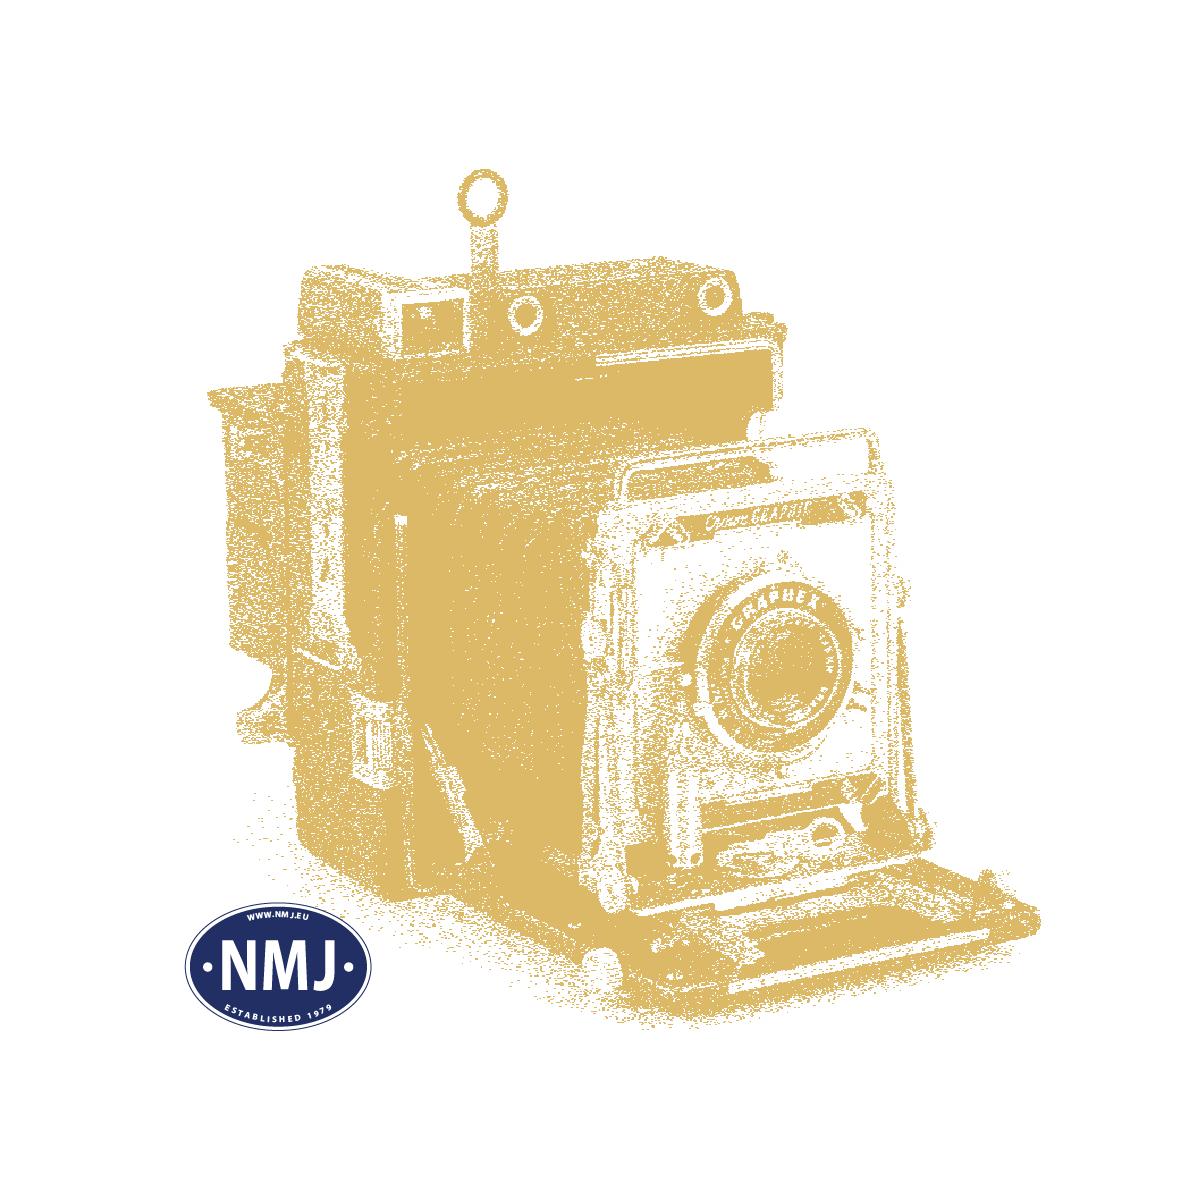 NMJT86.200 - NMJ Topline NSB El11.2093, Redbrown, DC